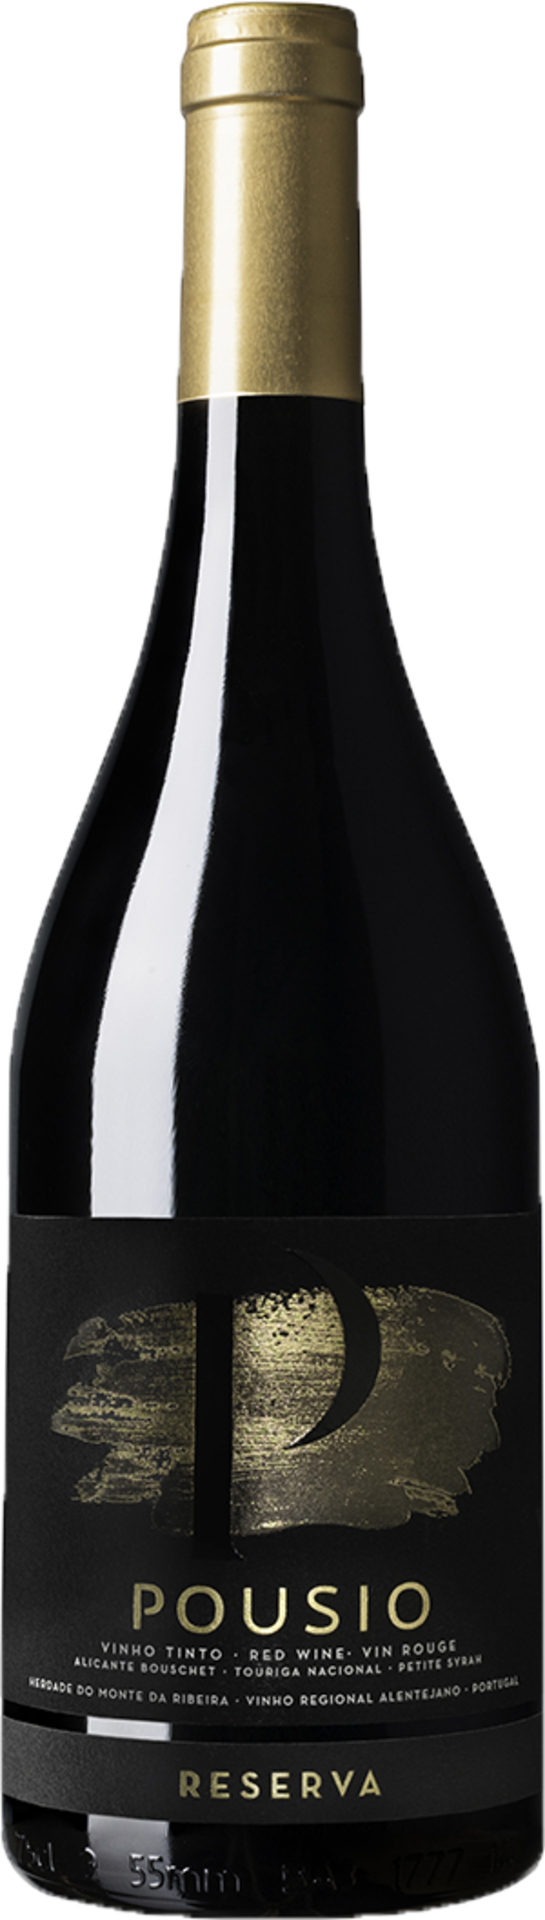 Pousio Vinho Tinto Selection Reserva Alentejano IG